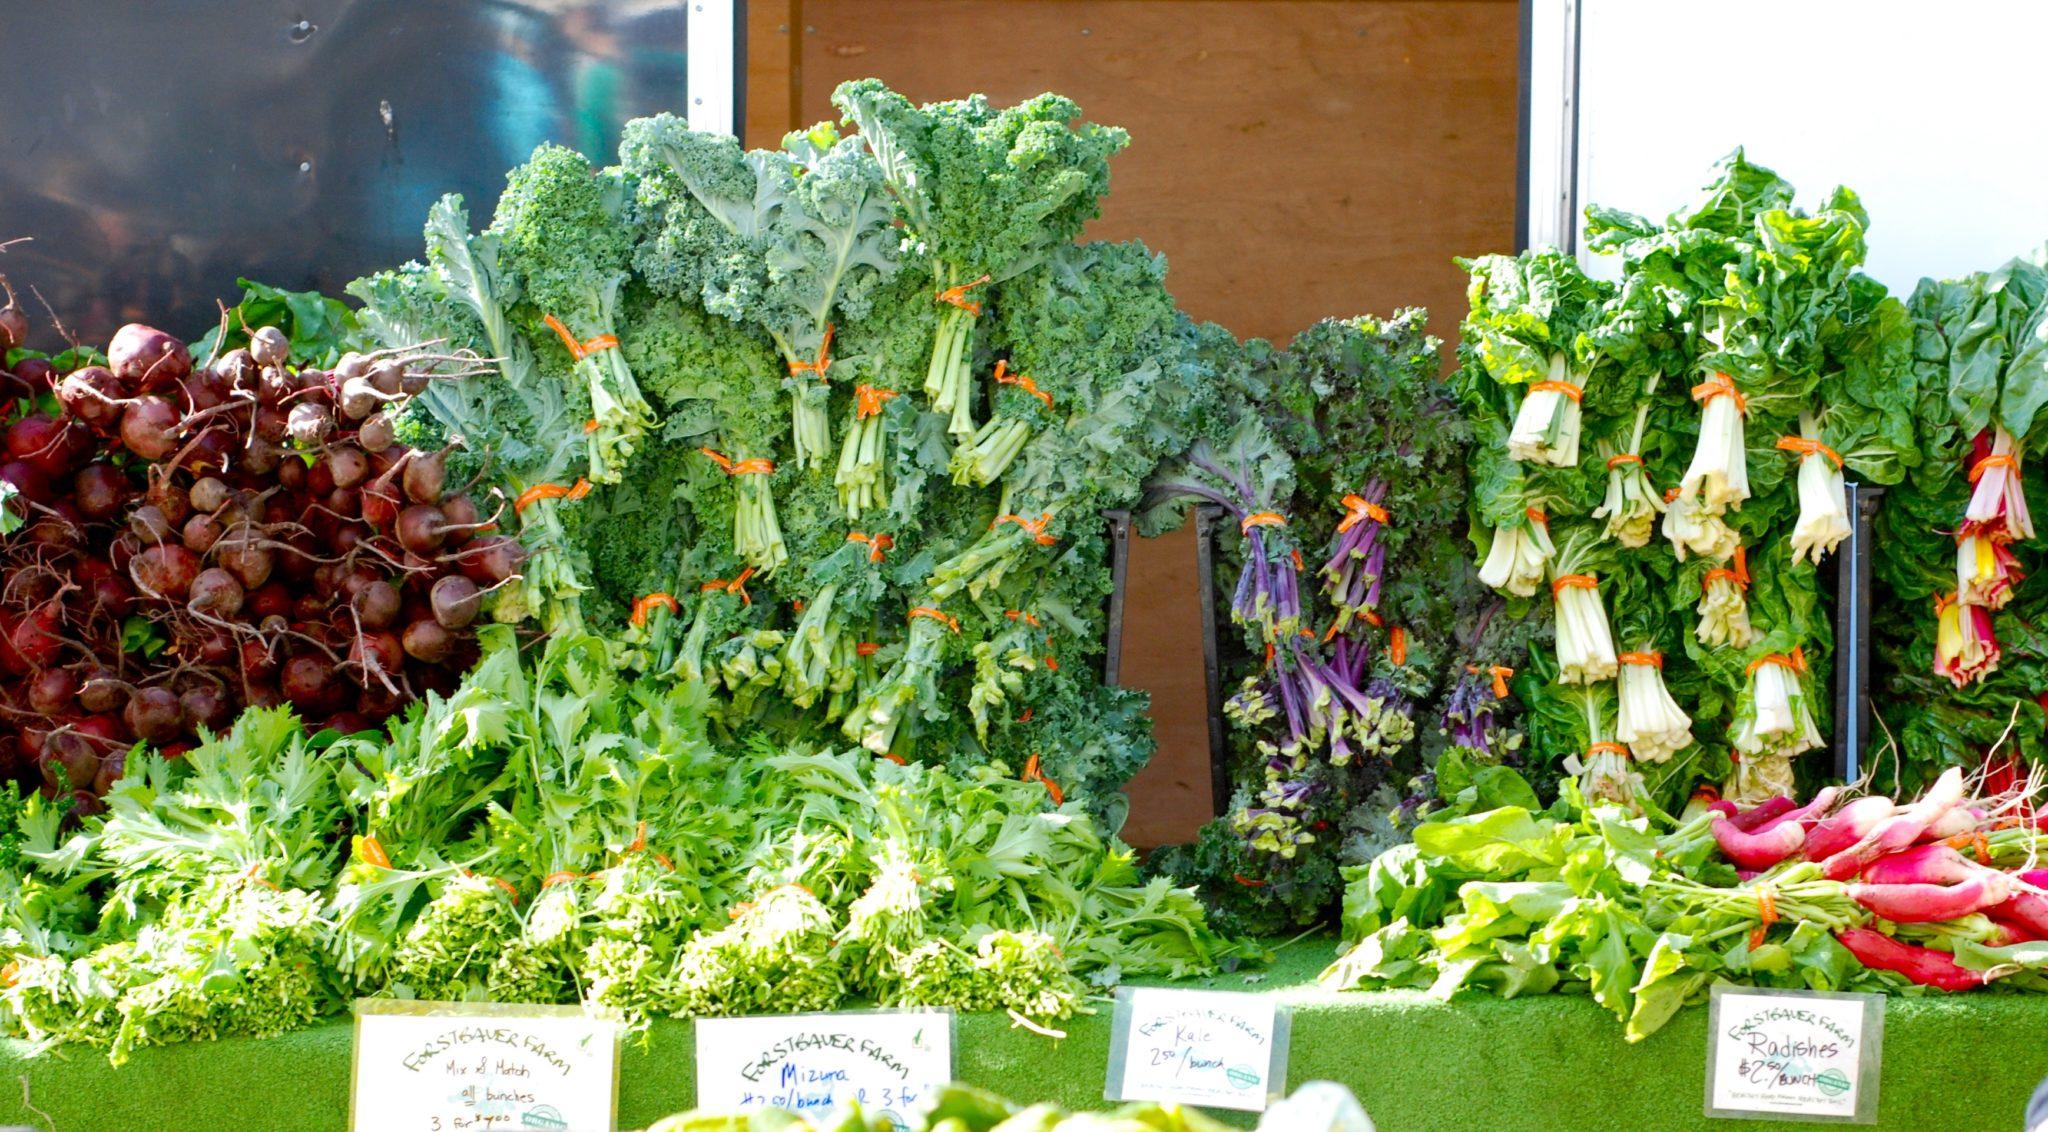 organic, produce, vegetables, fresh, local, farmers market, east van, trout lake